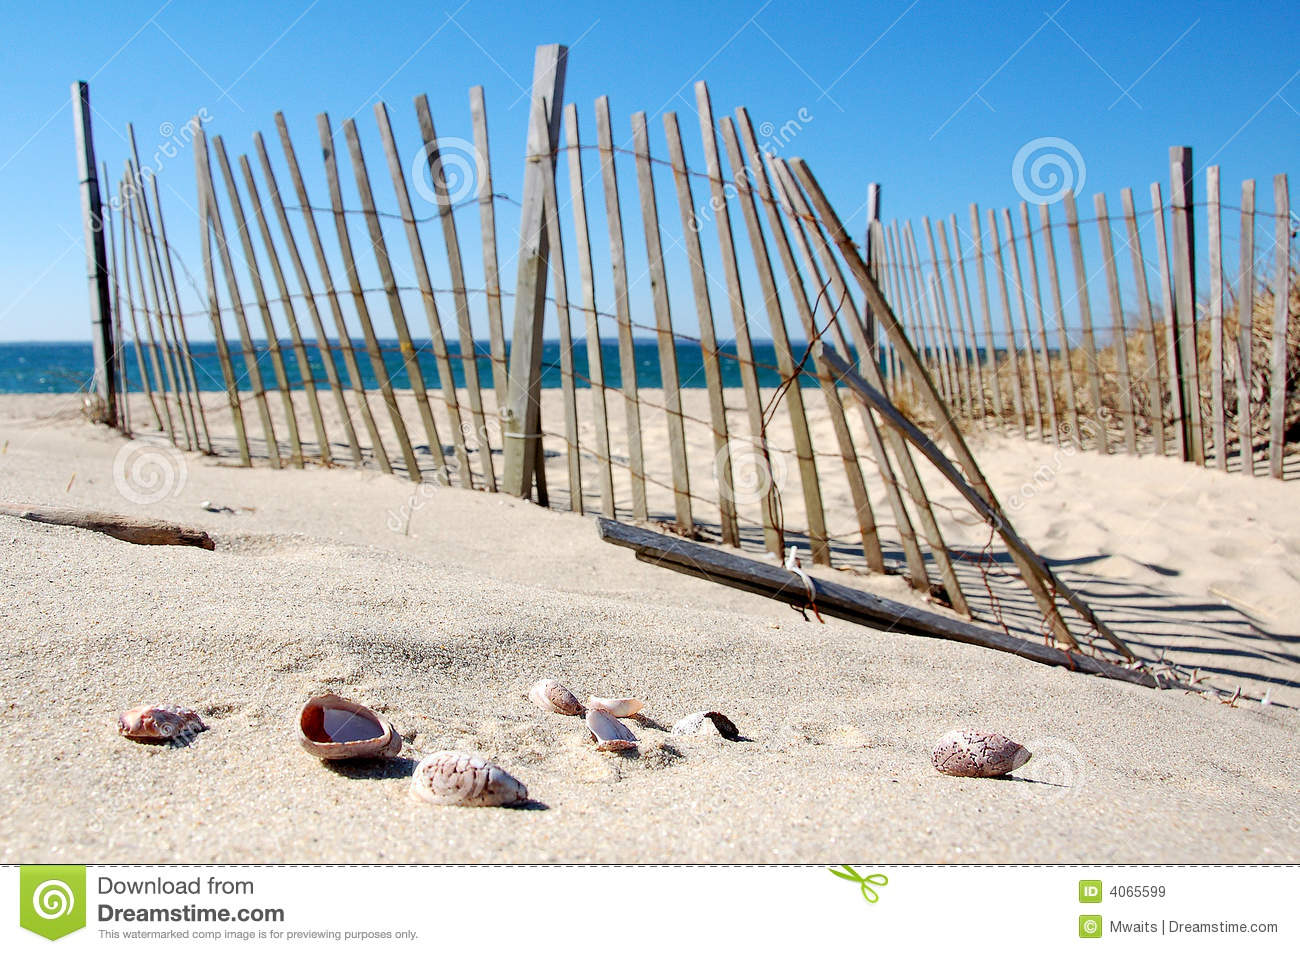 Cape Cod Scenes For Desktop HD Wallpapers 1300x954